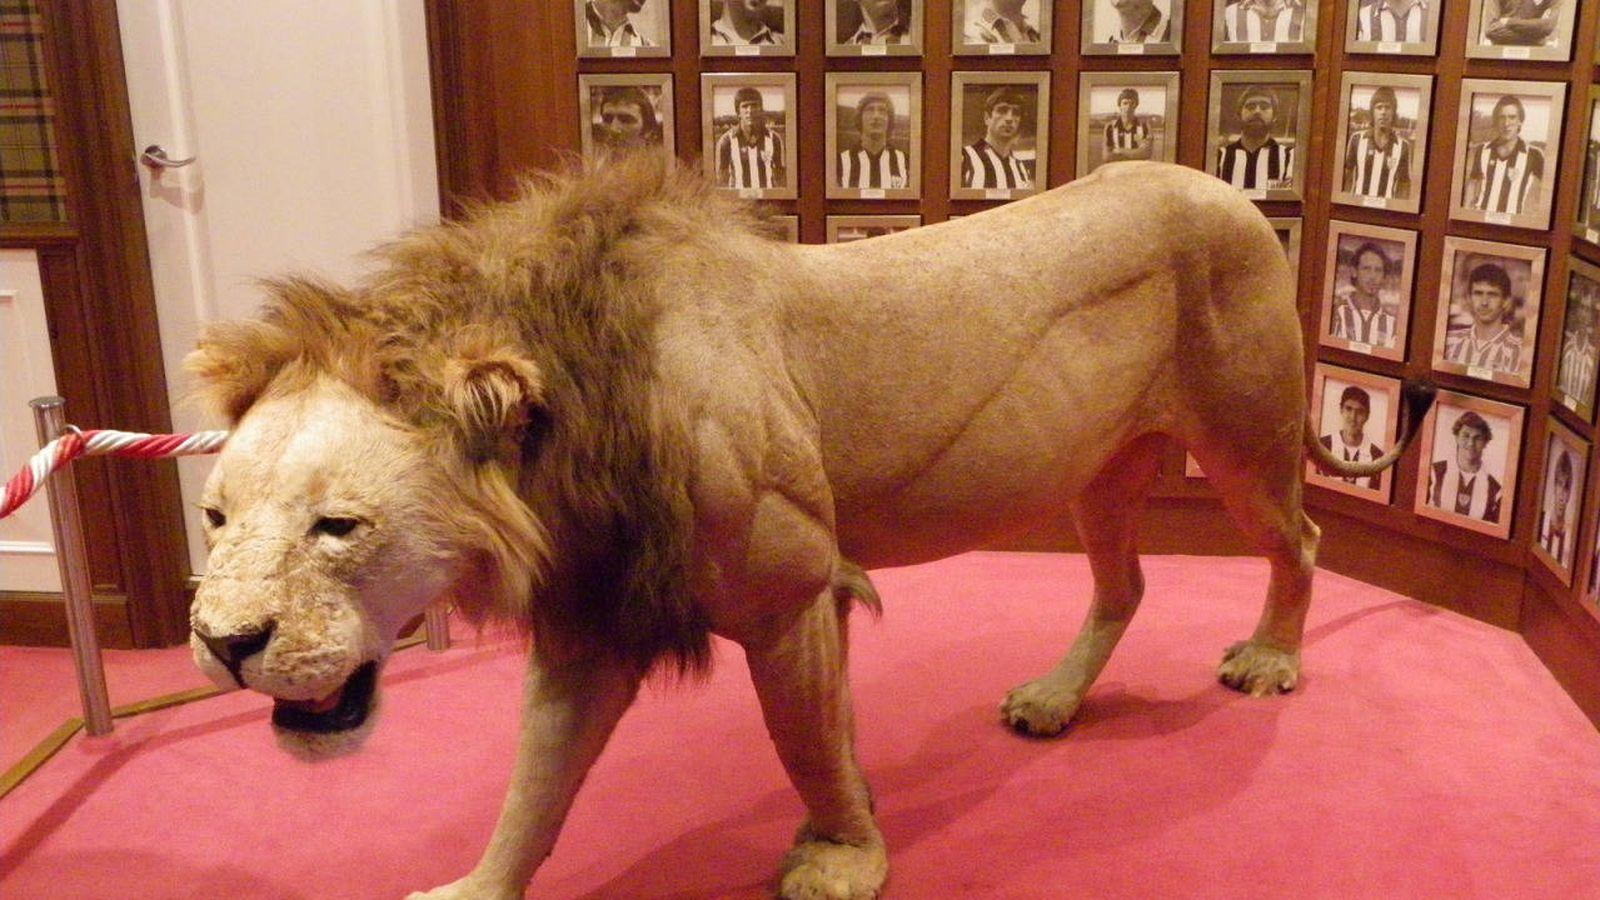 Foto: Imagen del famoso león que hay en San Mamés